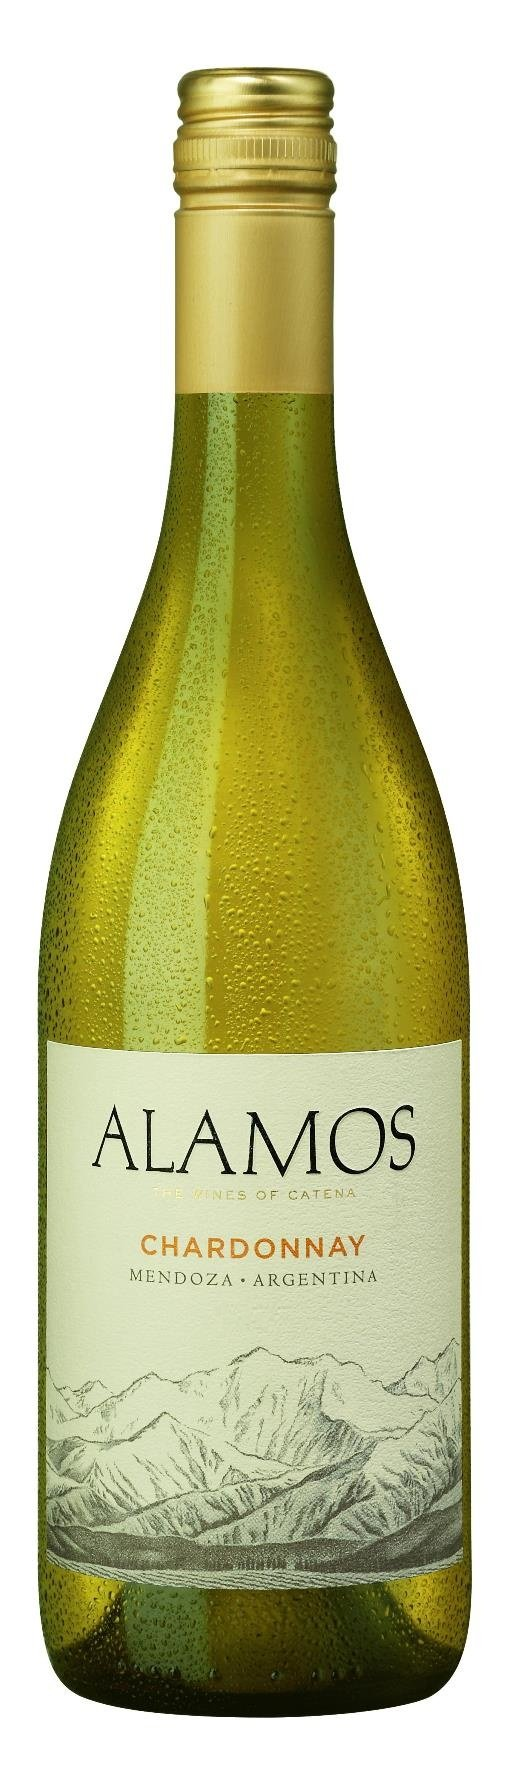 6x-075l-2016er-Alamos-Chardonnay-Mendoza-Argentinien-Weiwein-trocken